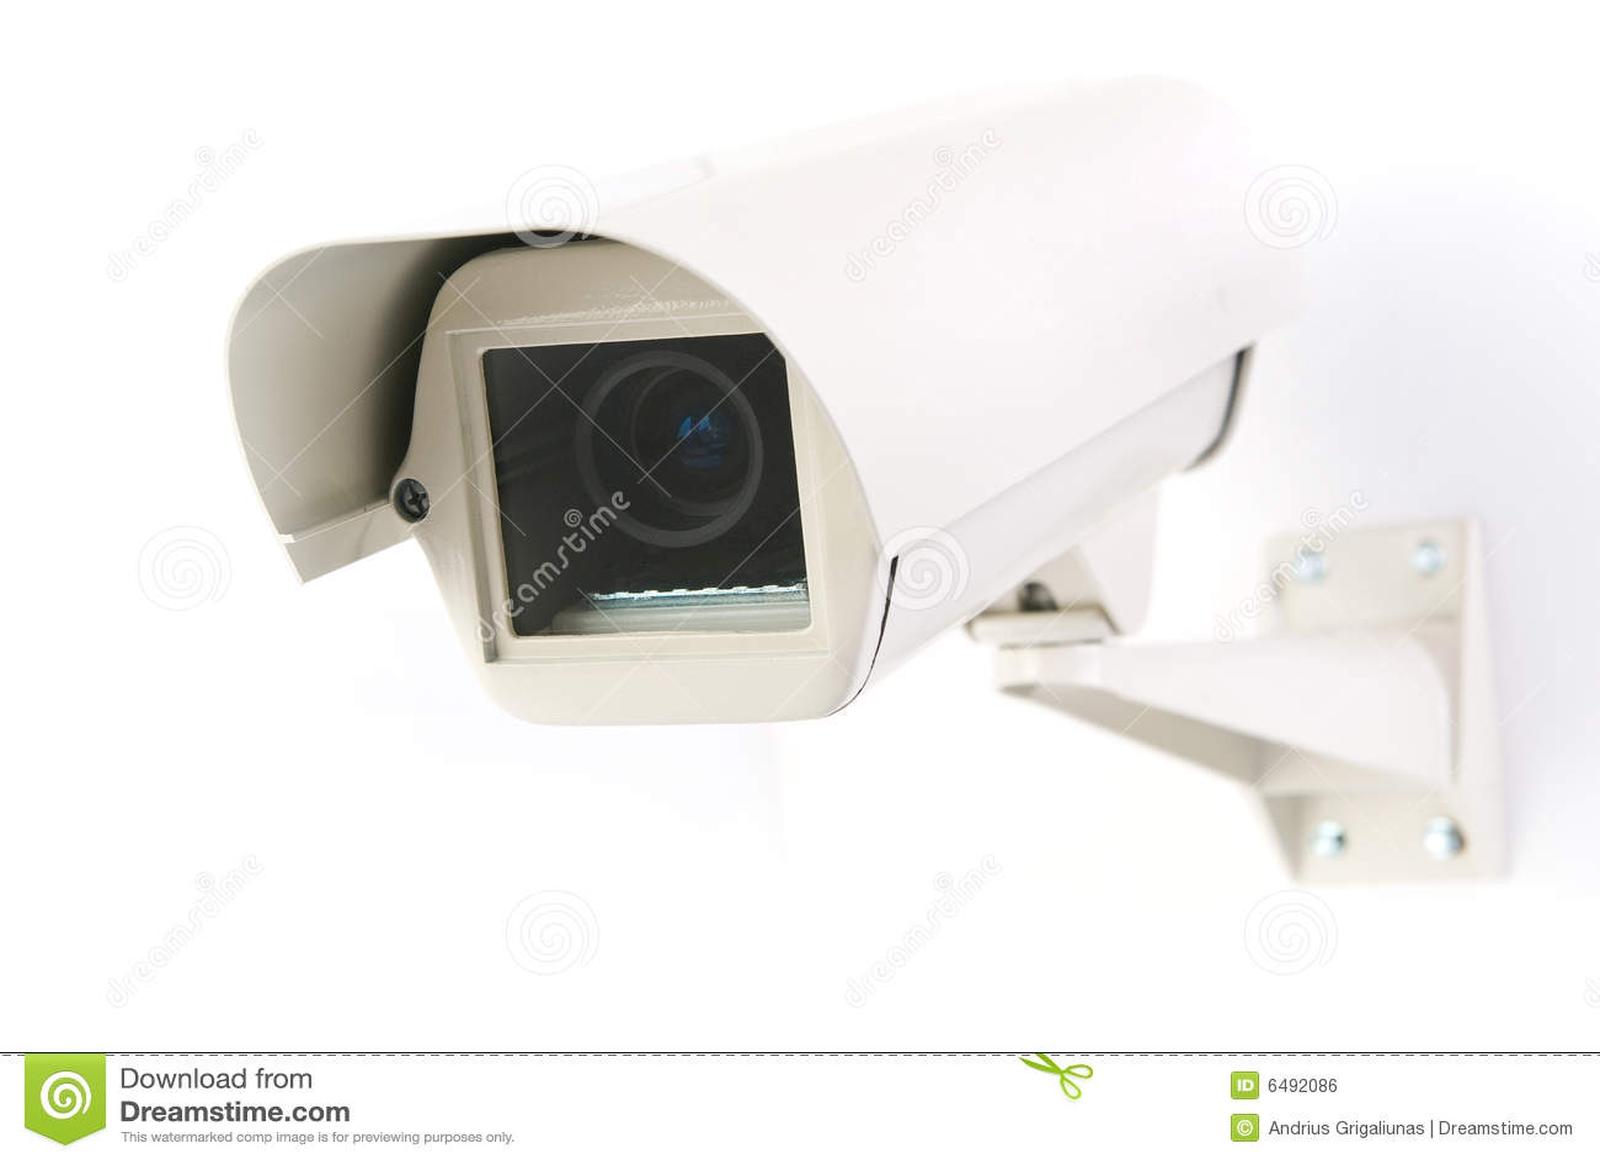 Cctv camera in housing